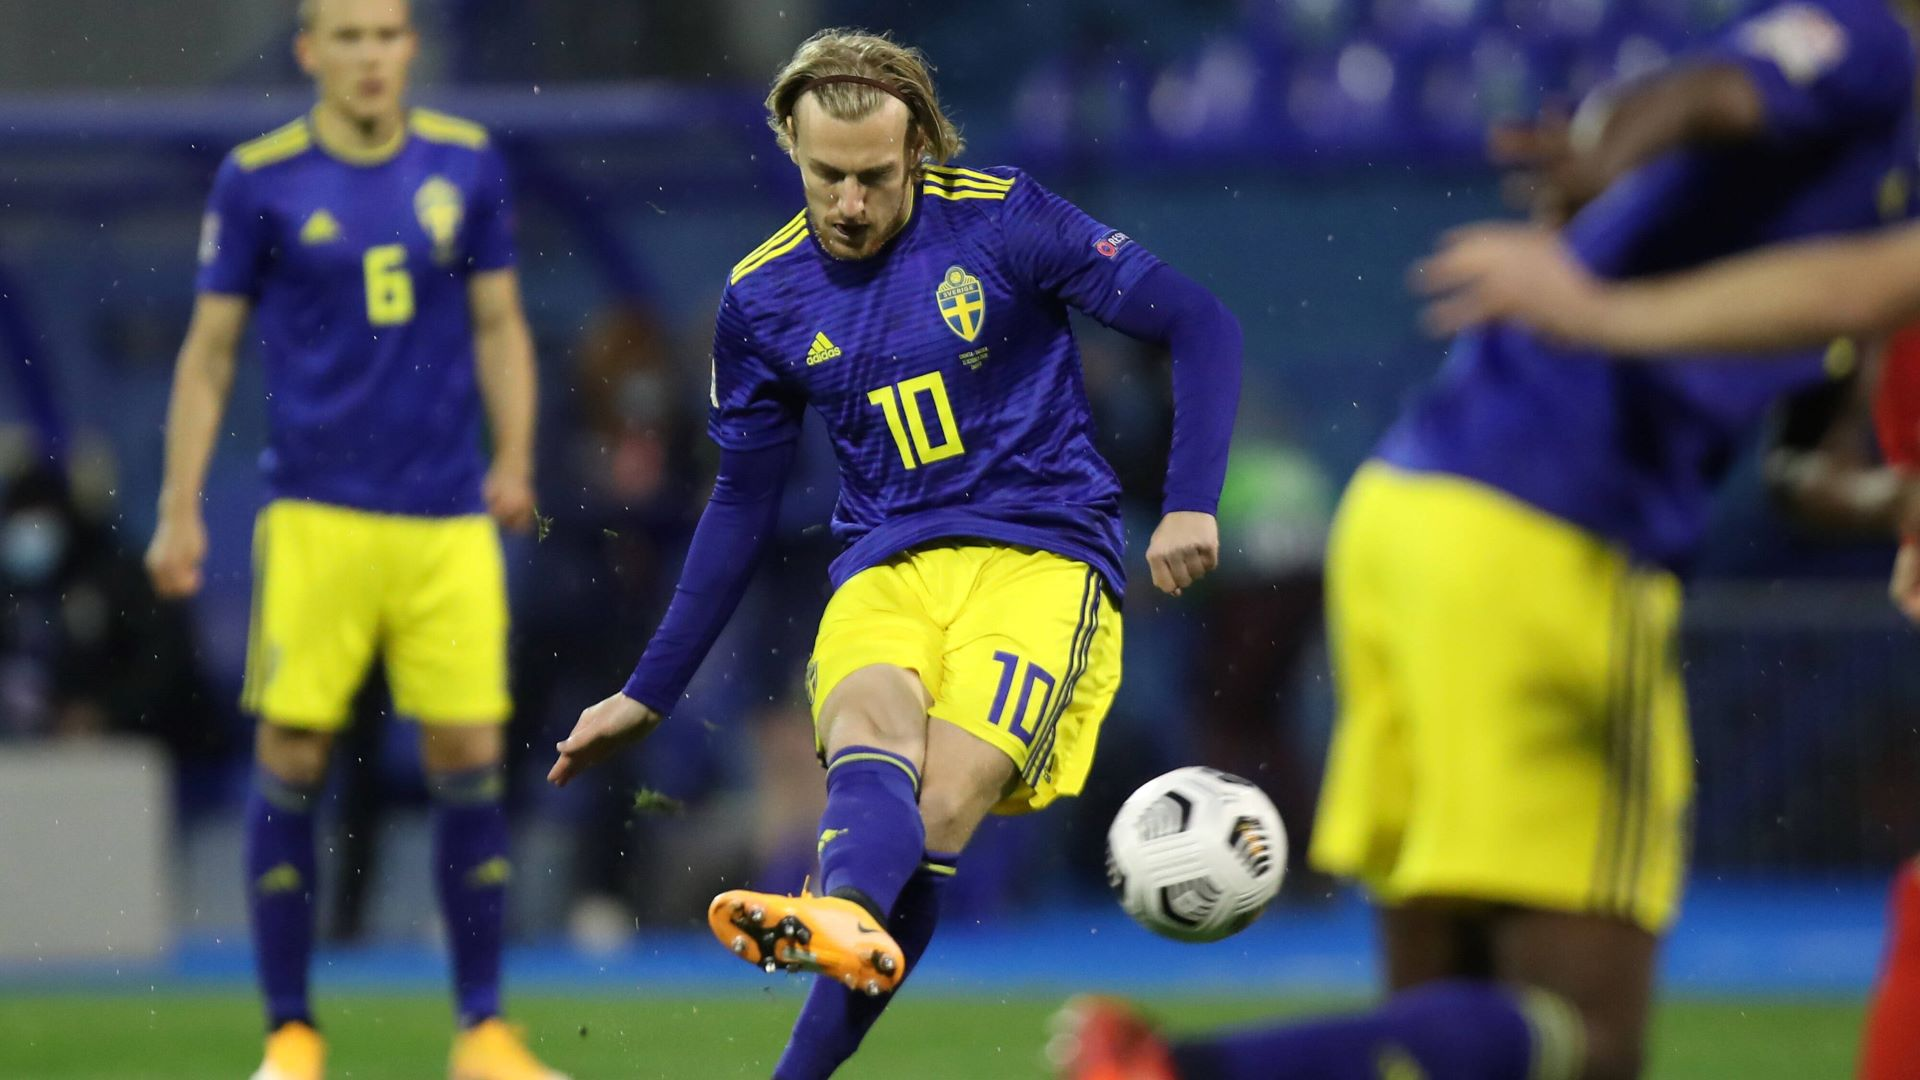 Schweden Kroatien Nations League Livestream